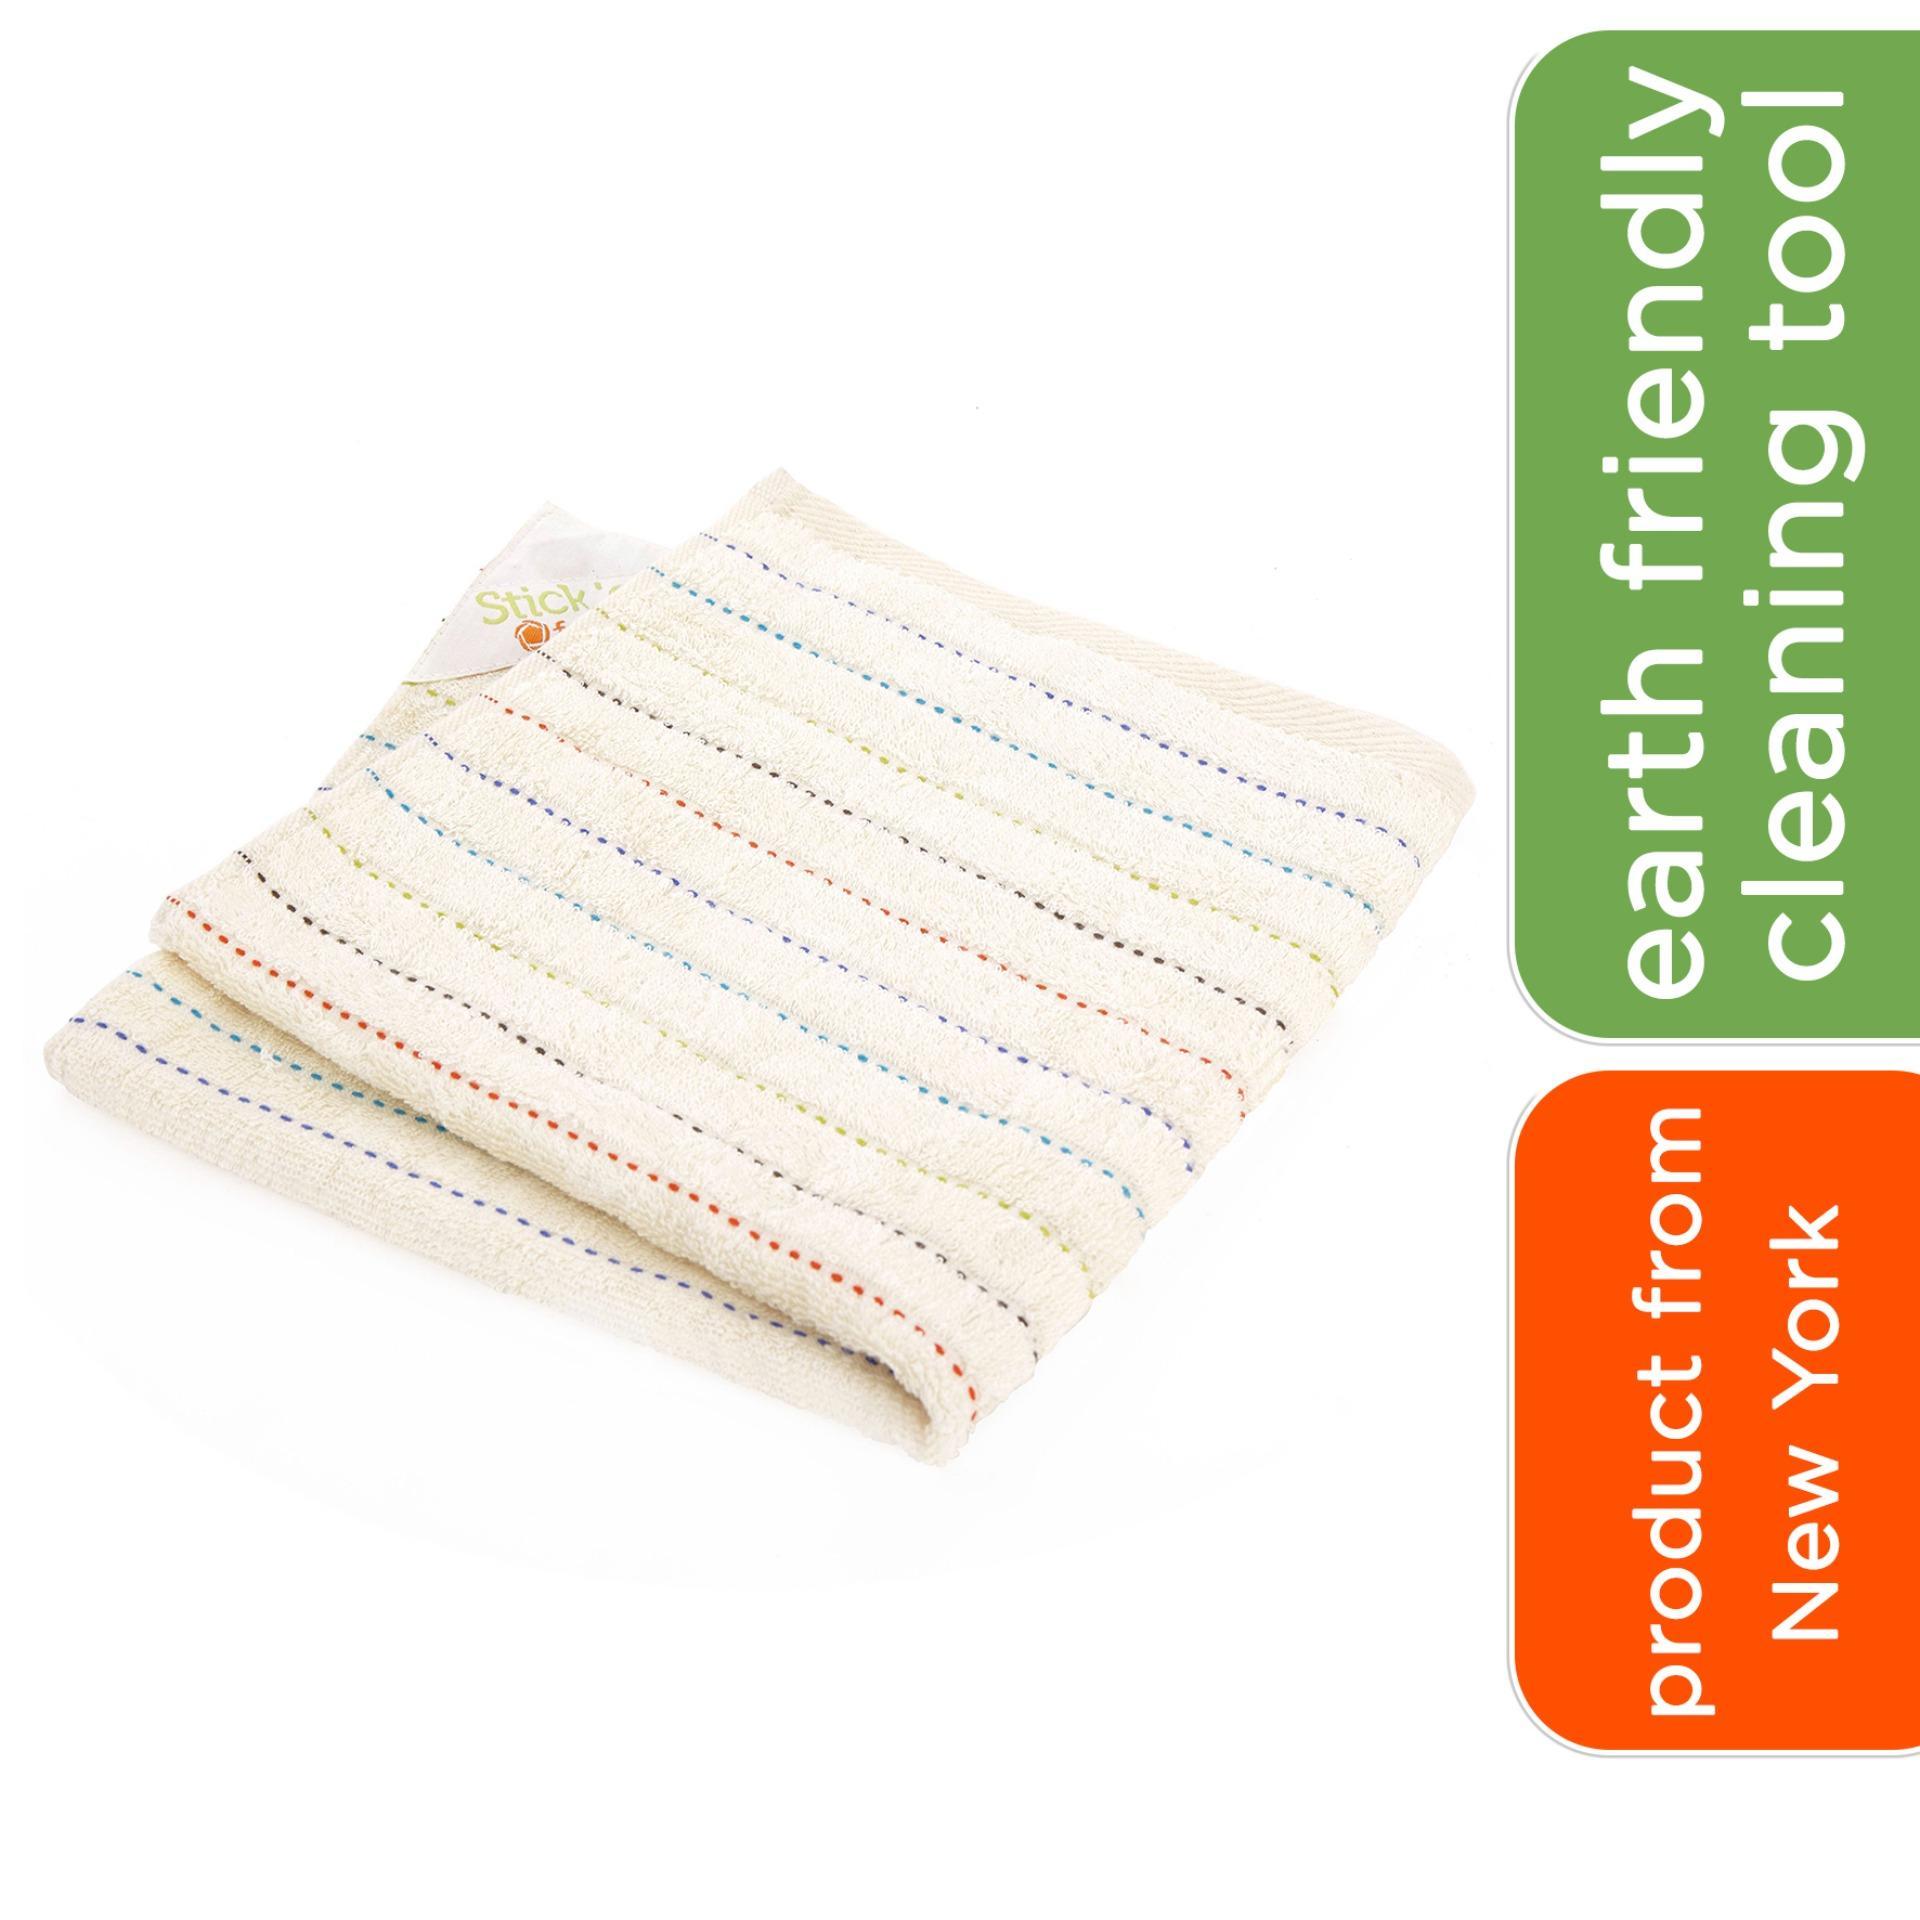 Full Circle Stick 'em Magnet Kitchen Towel - Beige By Corlison.